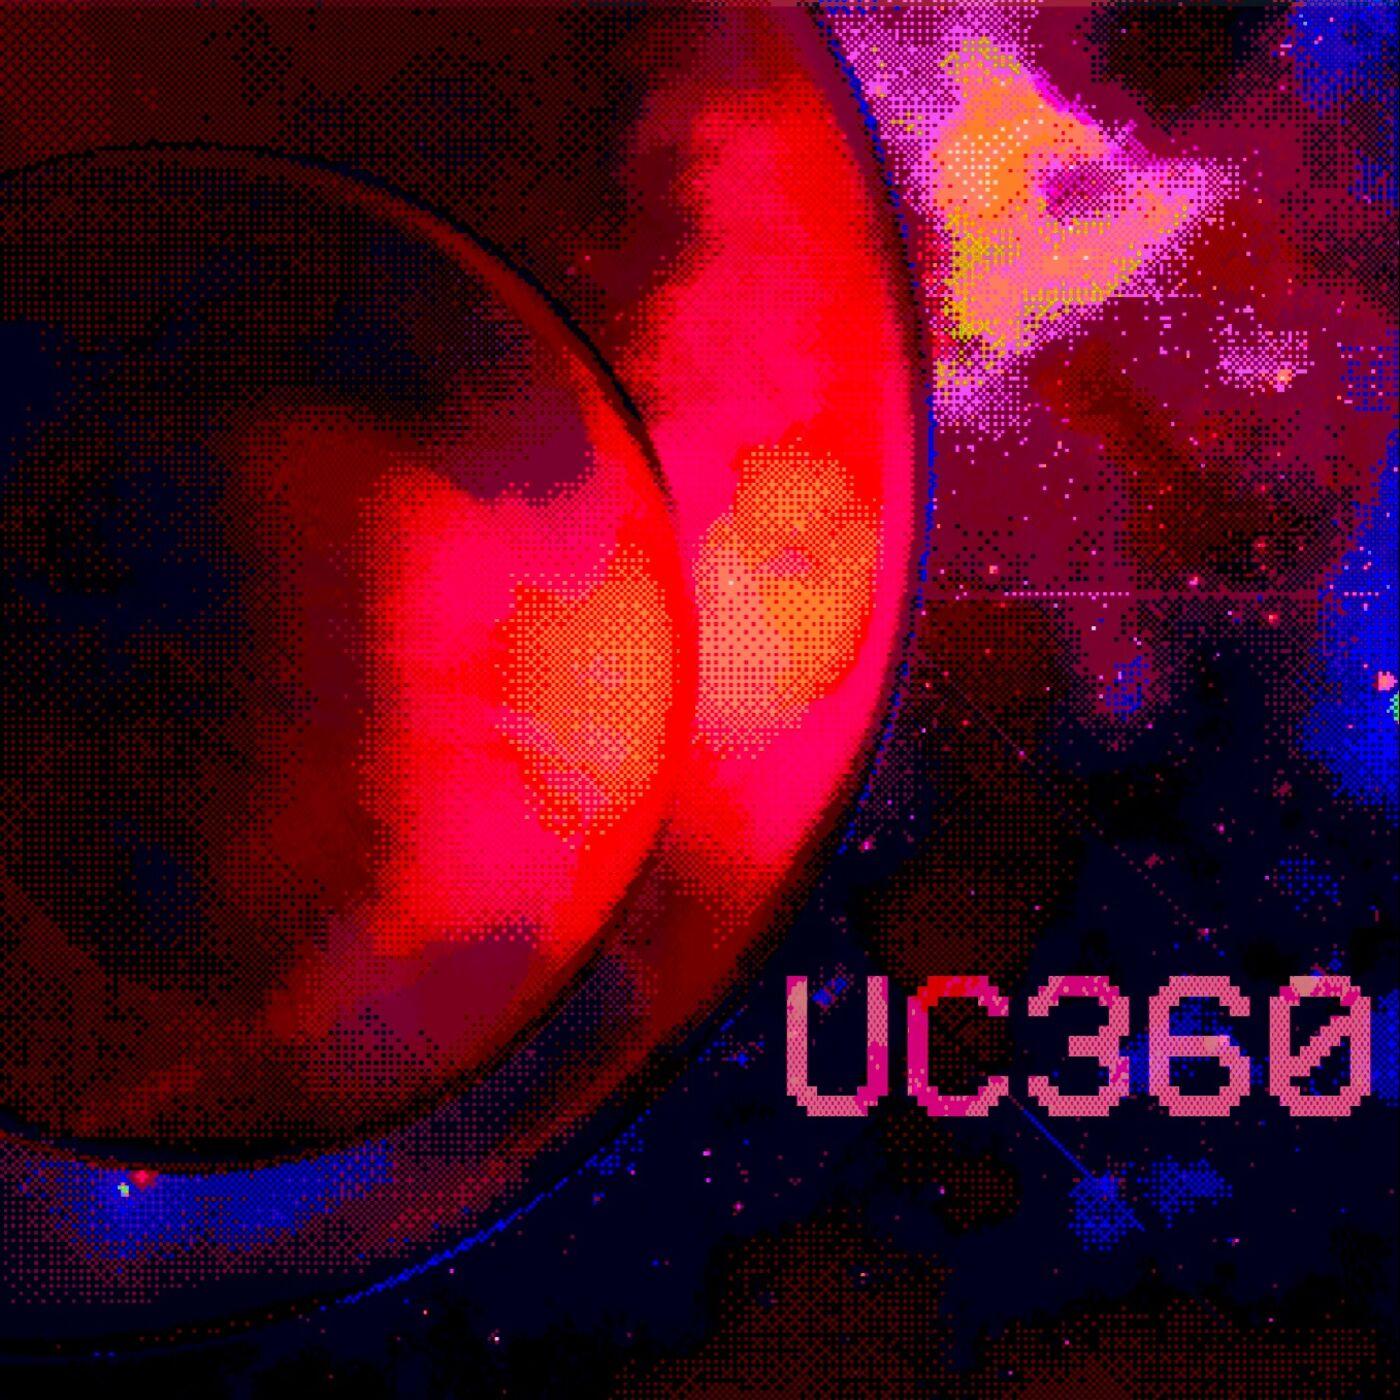 UC360